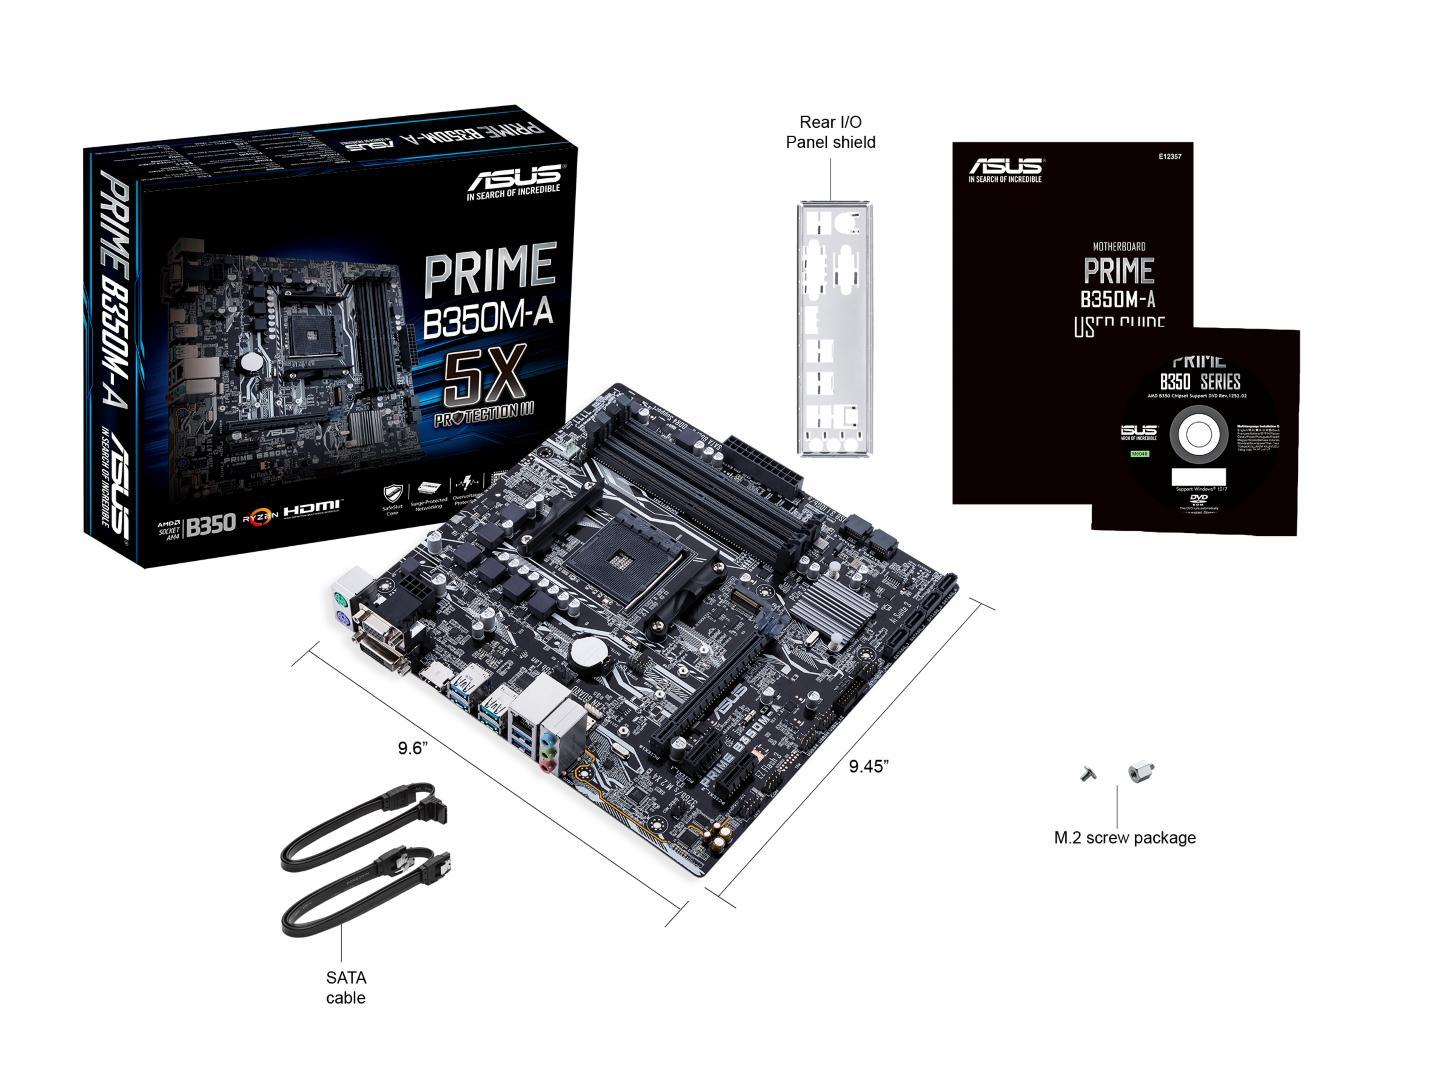 Asus PRIME B350M-A/CSM Micro ATX AM4